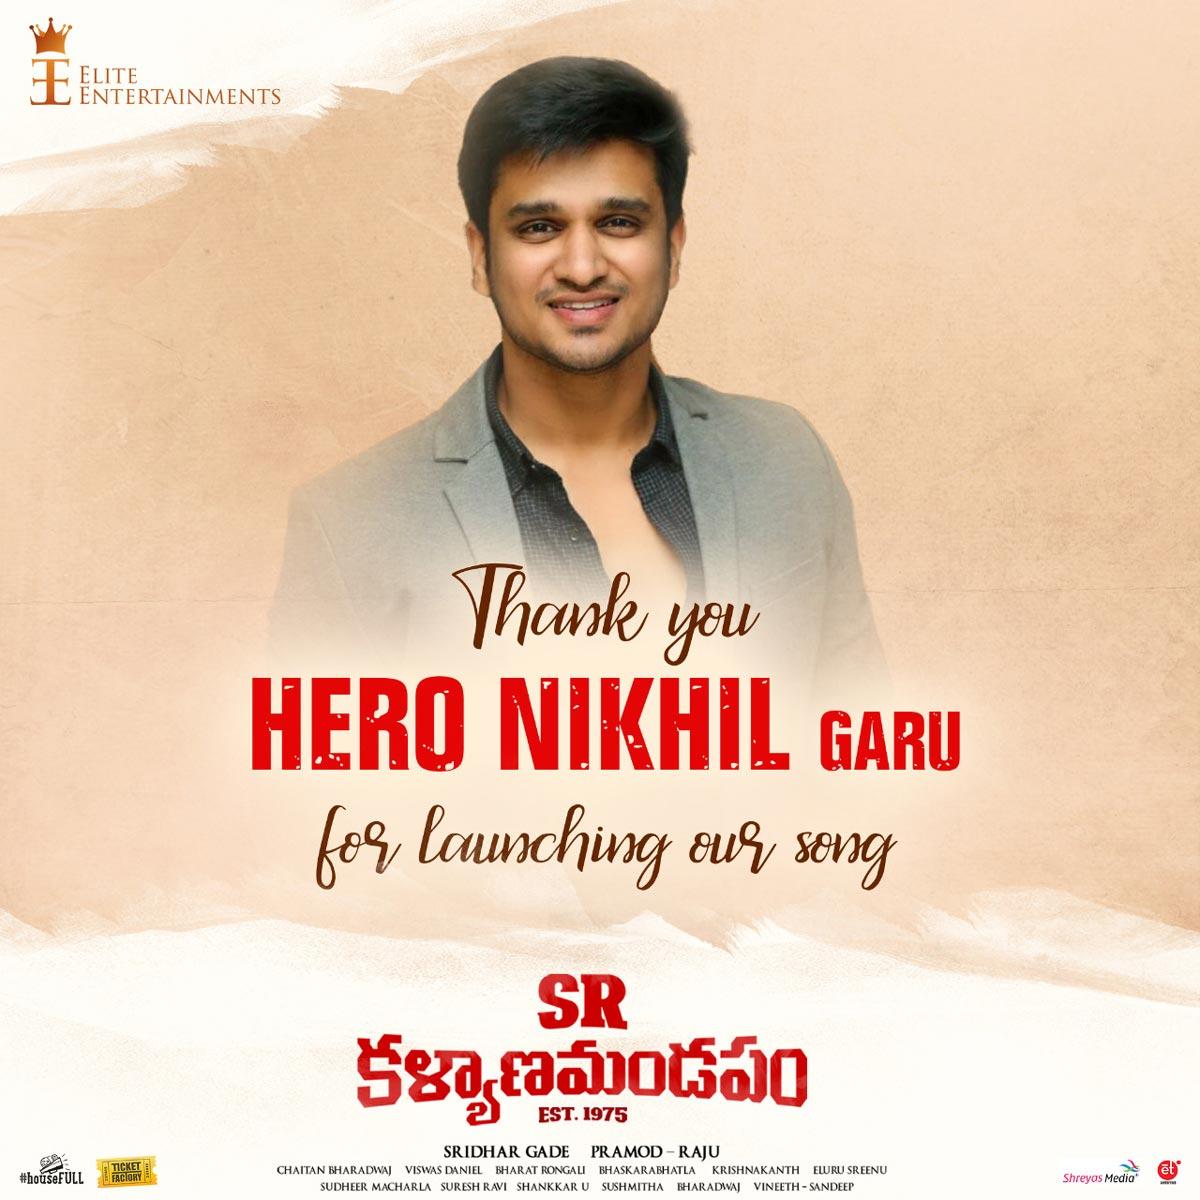 hero nikhil,sr kalyana mandapam,sid sriram,song released  ఎస్.ఆర్.కళ్యాణమండపం సాంగ్కు సూపర్బ్ రెస్పాన్స్!